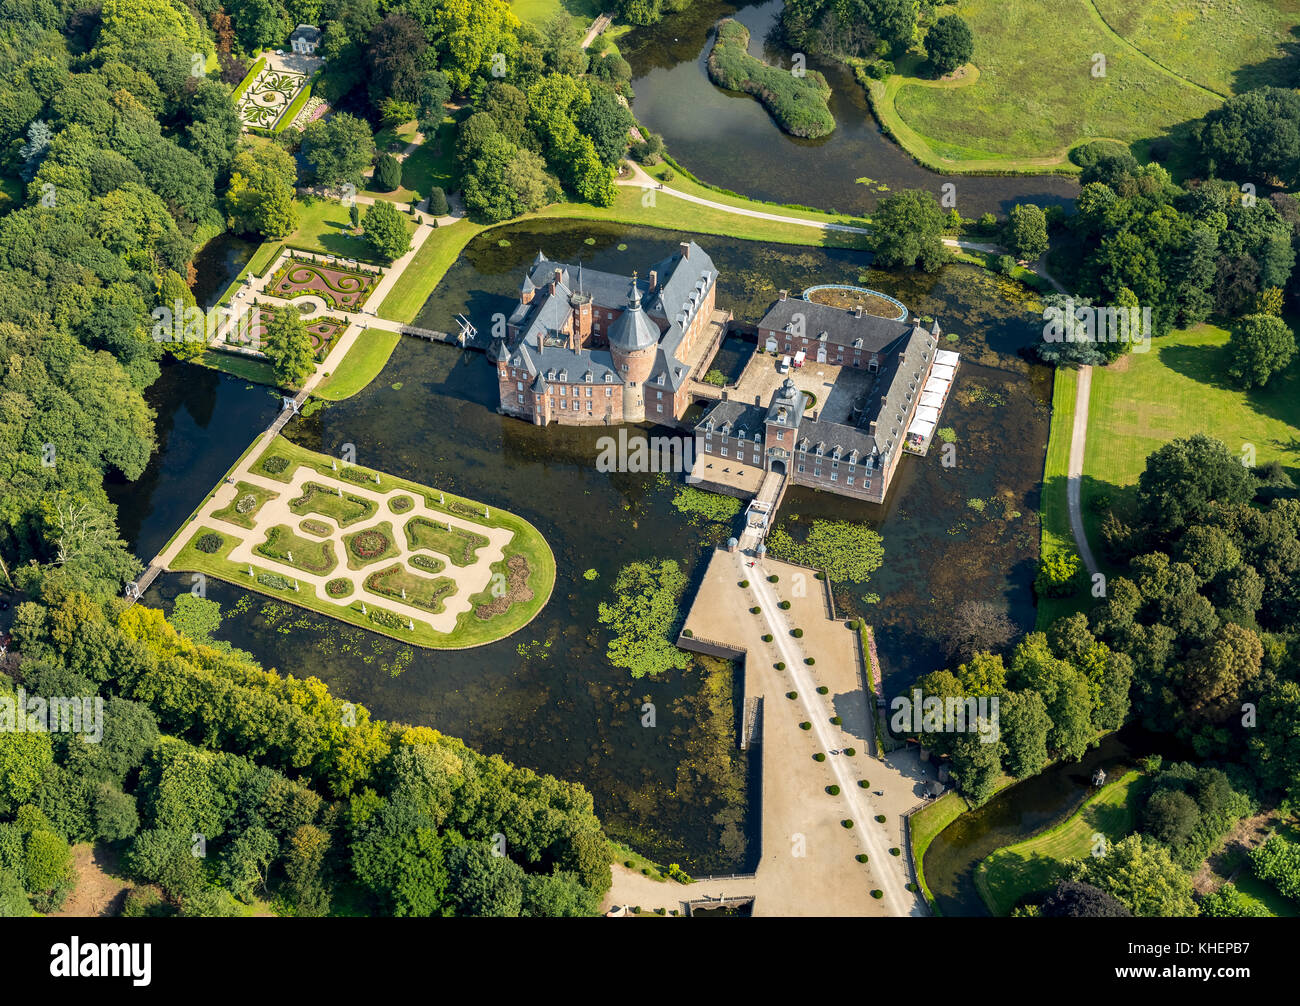 Romantik Parkhotel moated castle Anholt, Museum moated castle Anholt, with baroque garden, Wasserschloss Anholt, - Stock Image